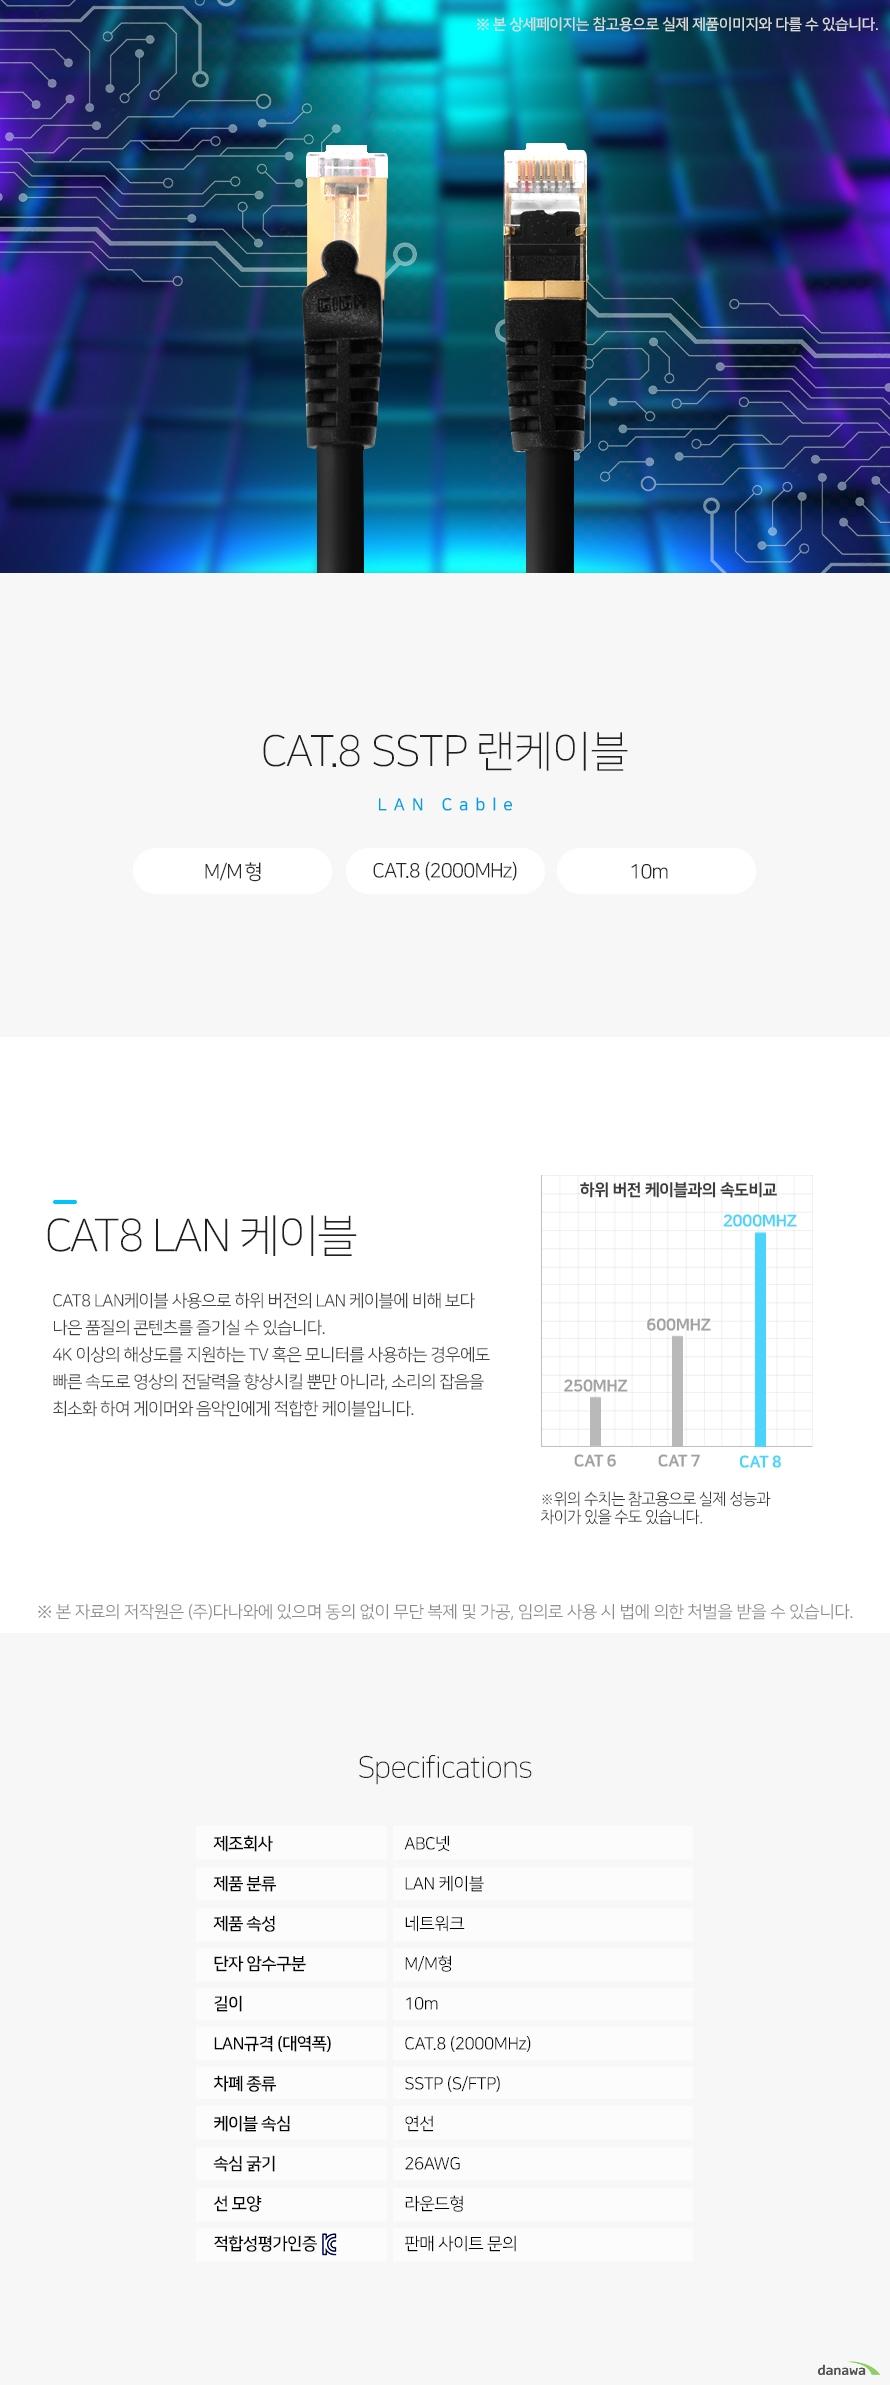 ABC넷 CAT.8 SSTP 랜케이블 (10m) 상세 스펙 LAN 케이블 / 네트워크 / M/M형 / CAT.8 (2000MHz) / SSTP (S/FTP) / 연선 / 26AWG / 라운드형 / RJ45 / RJ45